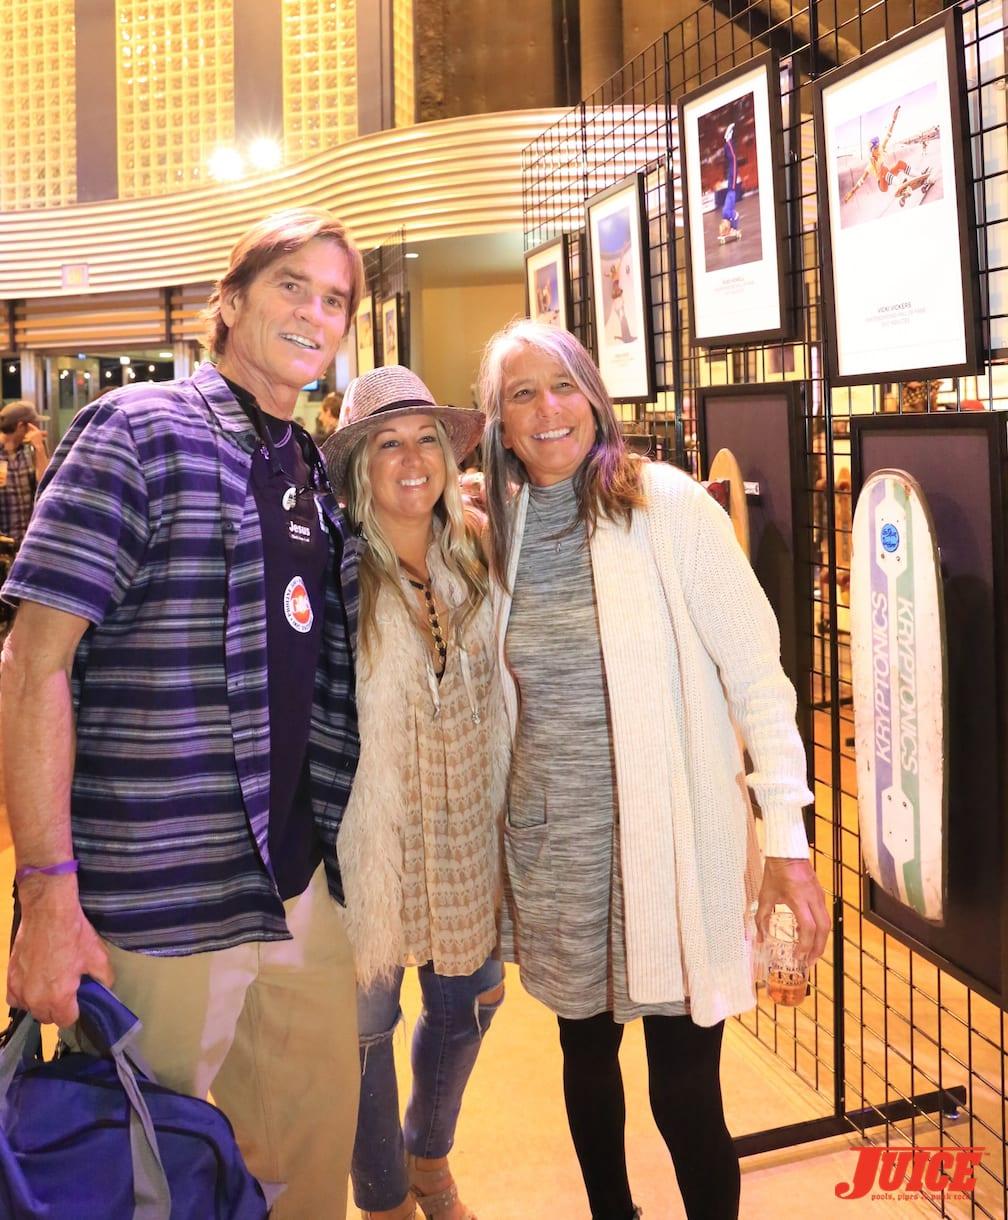 Dennis Ogden (Marina Skate Park), Cindy Whitehead, and Kim Cespedes photo by Dan Levy © Juice Magazine